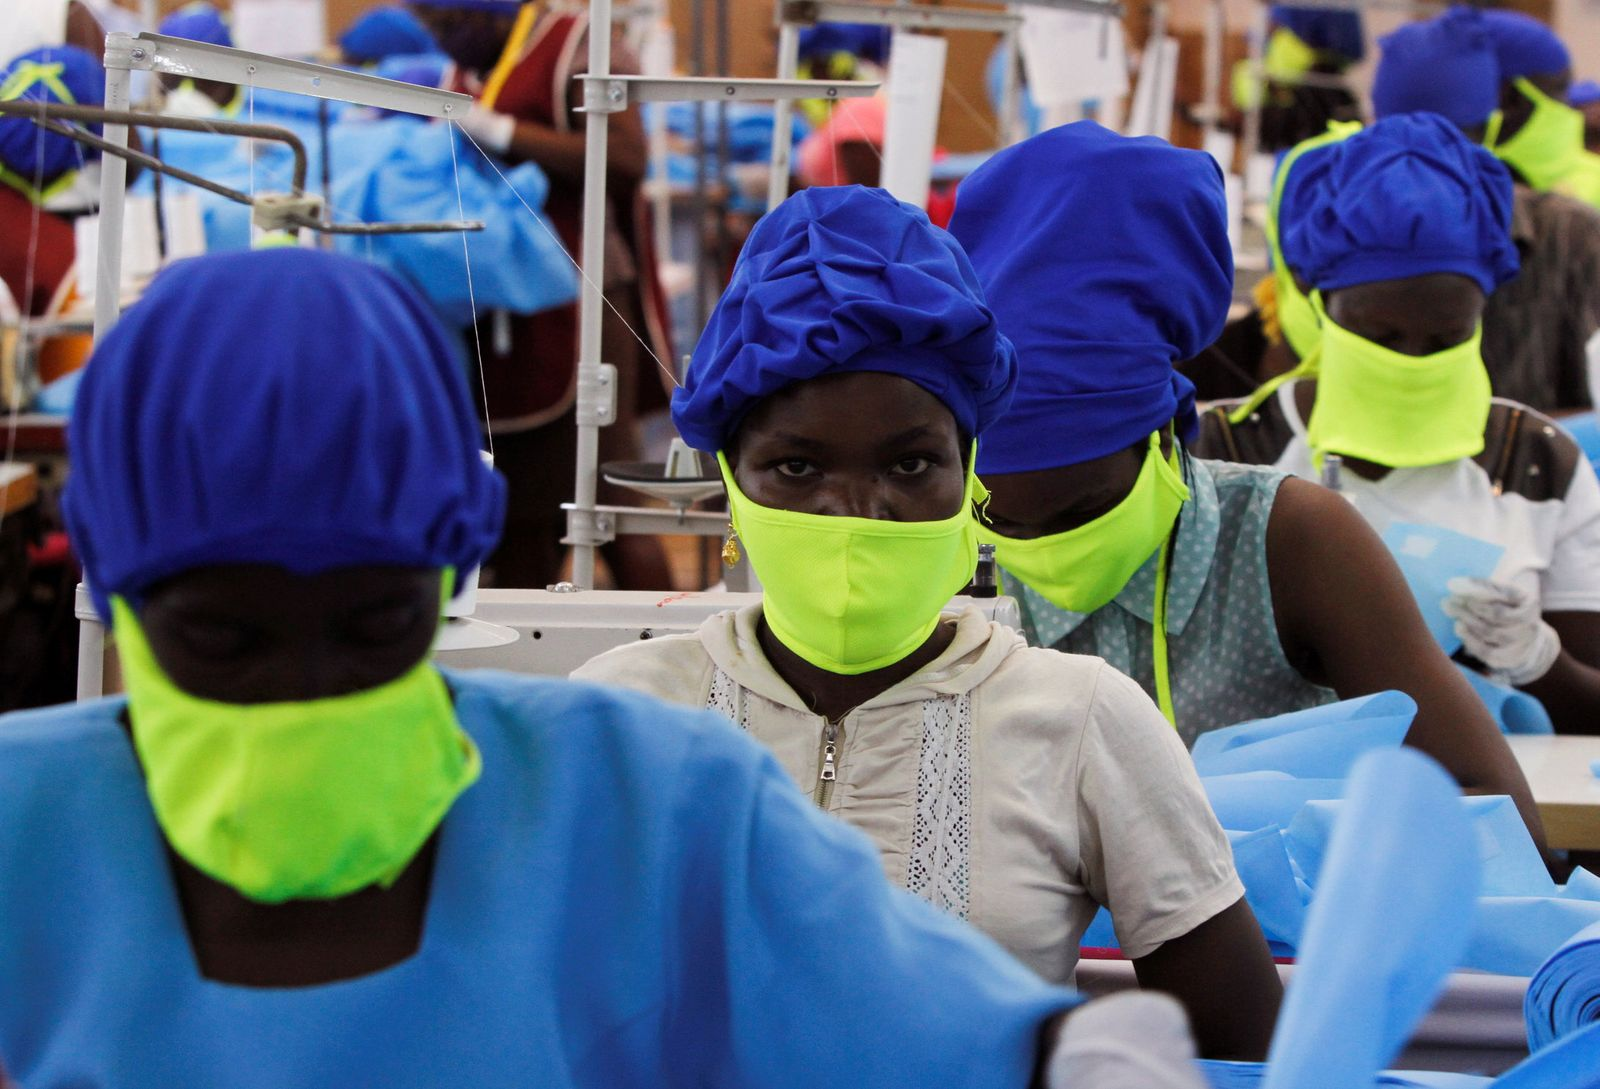 The coronavirus disease (COVID-19) outbreak, in Athi River near Nairobi